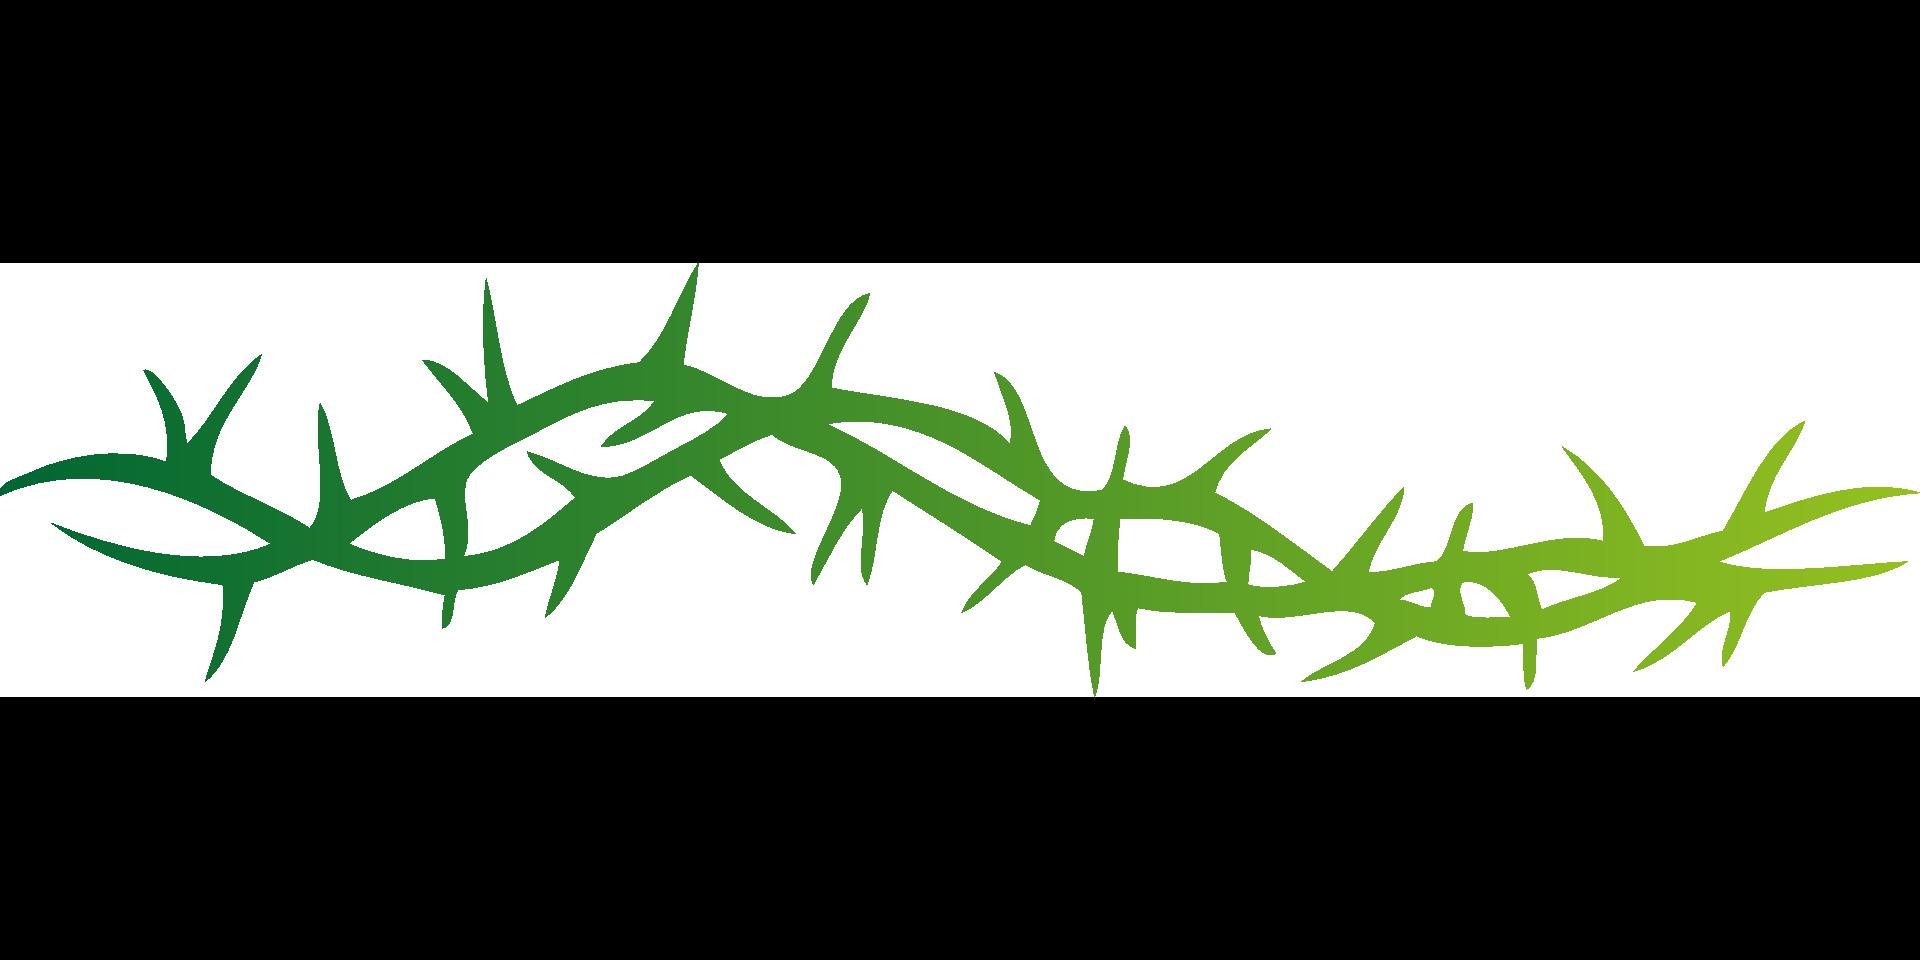 Thorns 149735